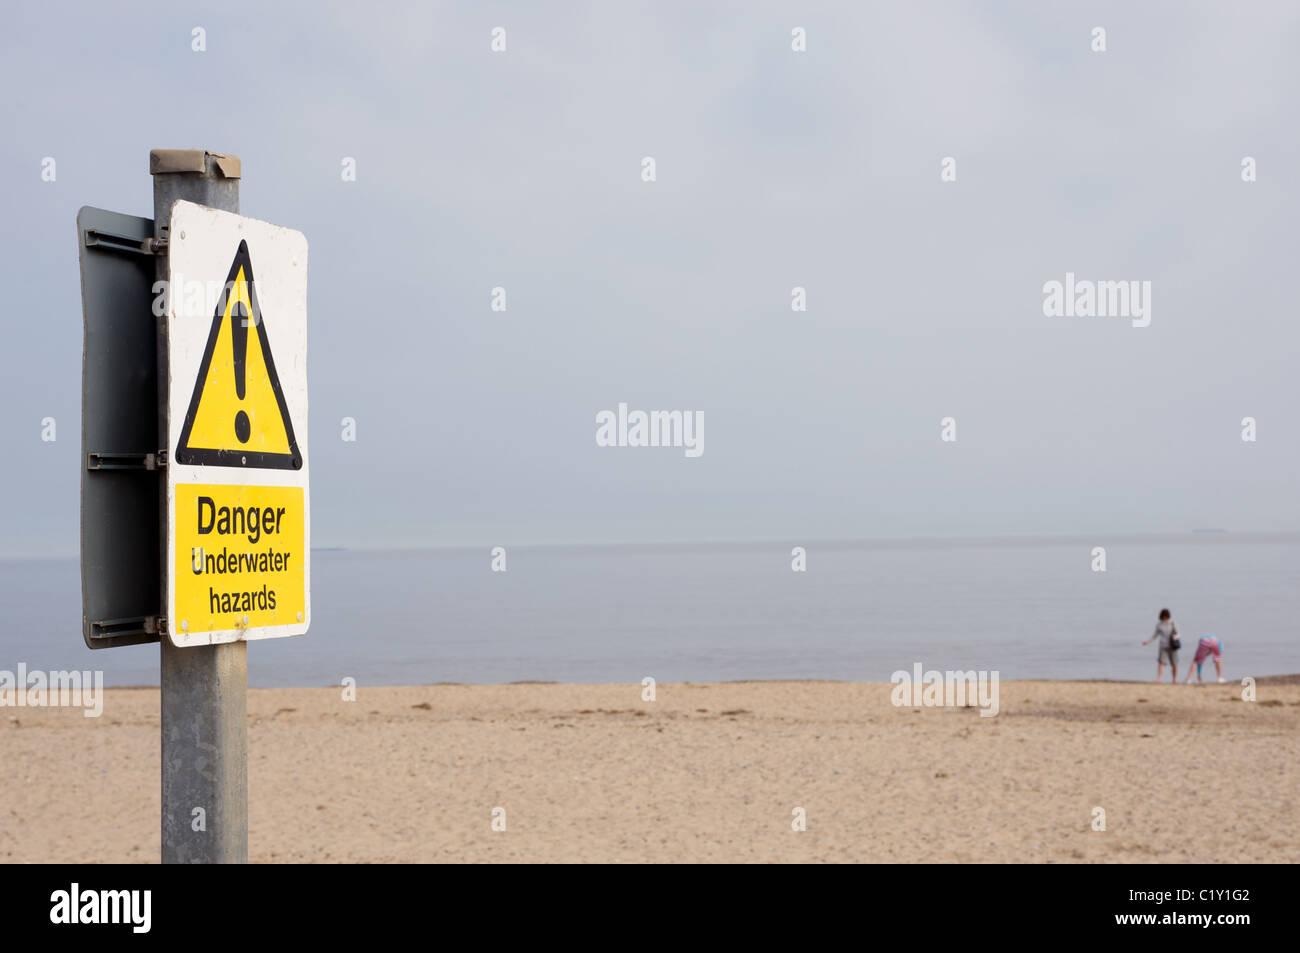 Danger underwater hazards sign, Suffolk, UK. - Stock Image